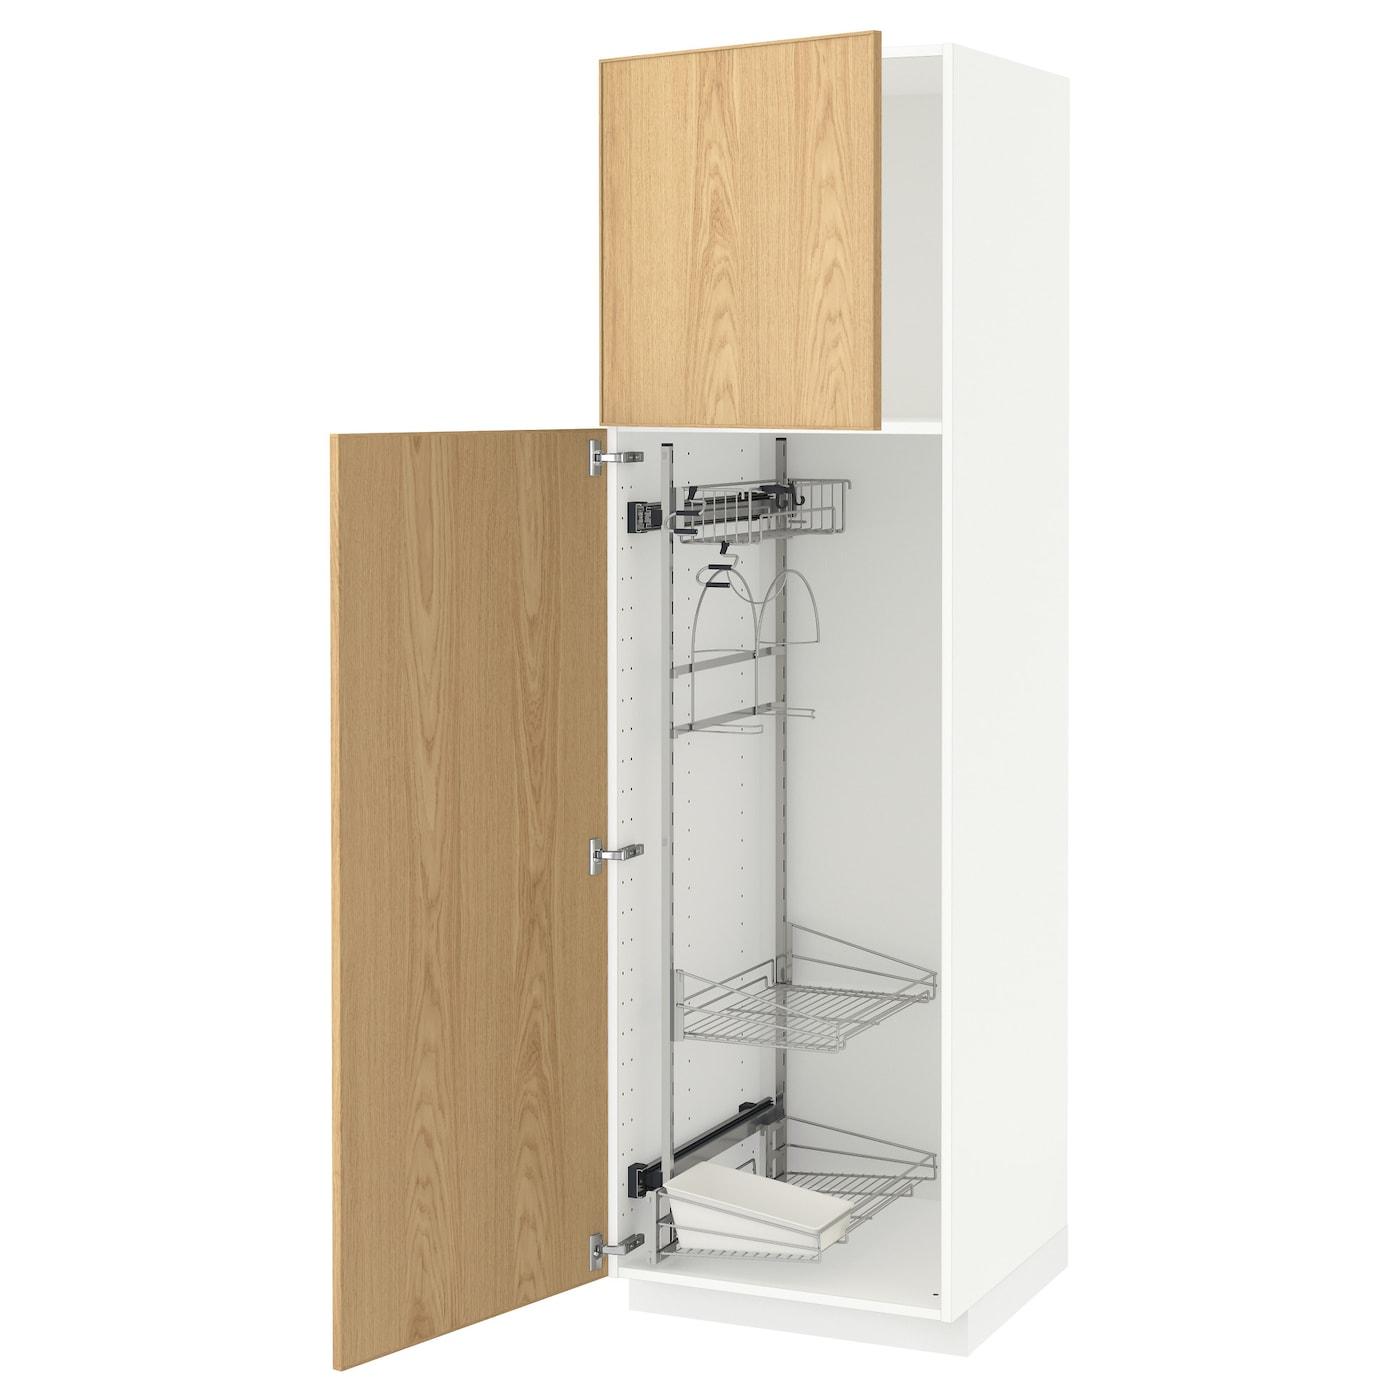 Metod High Cabinet With Cleaning Interior White Ekestad Oak Ikea